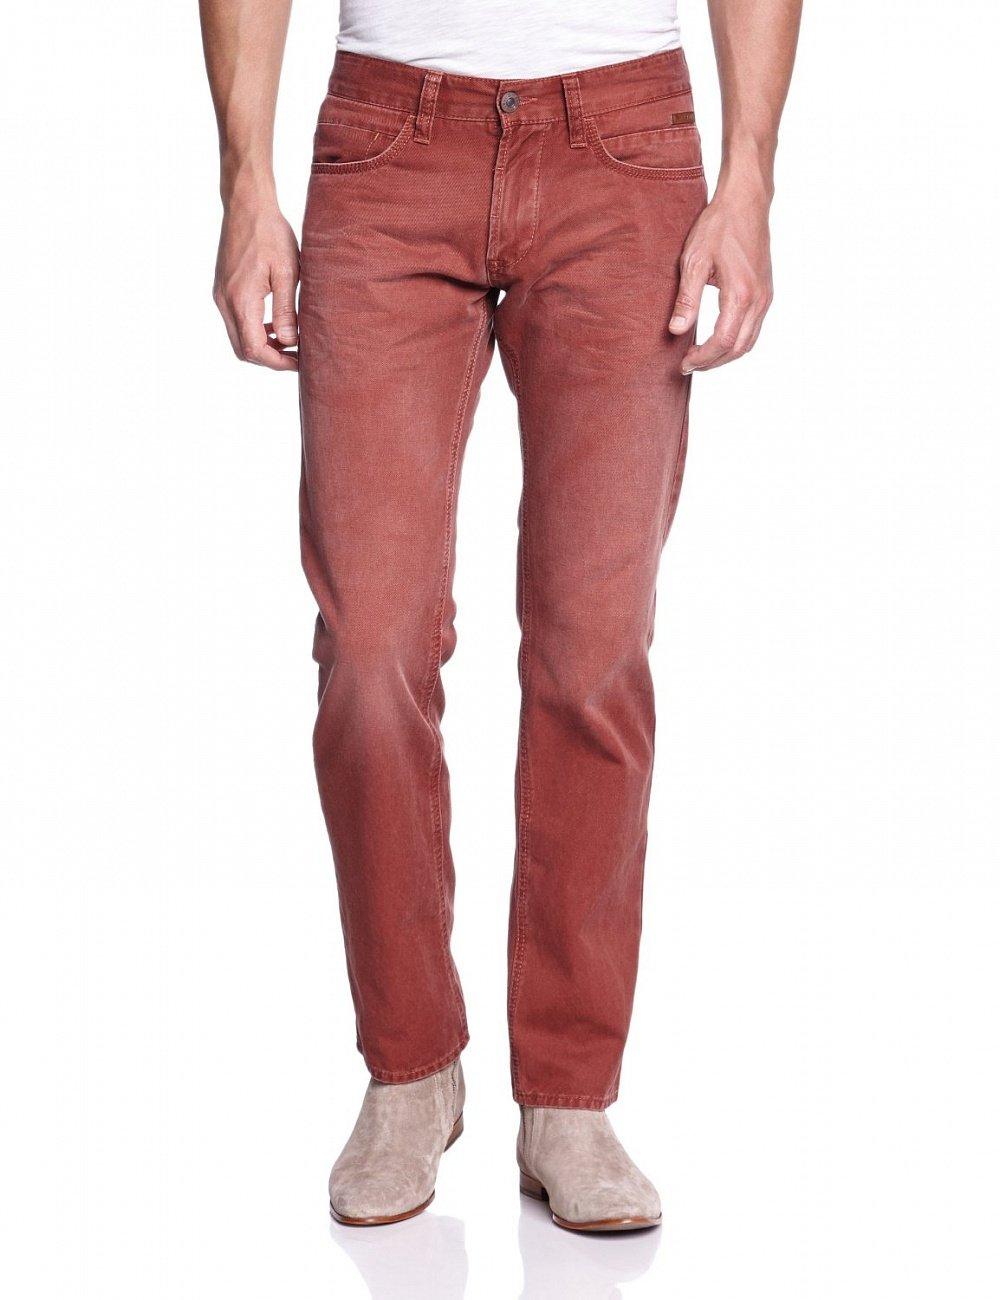 Выбеленные штаны красного цвета